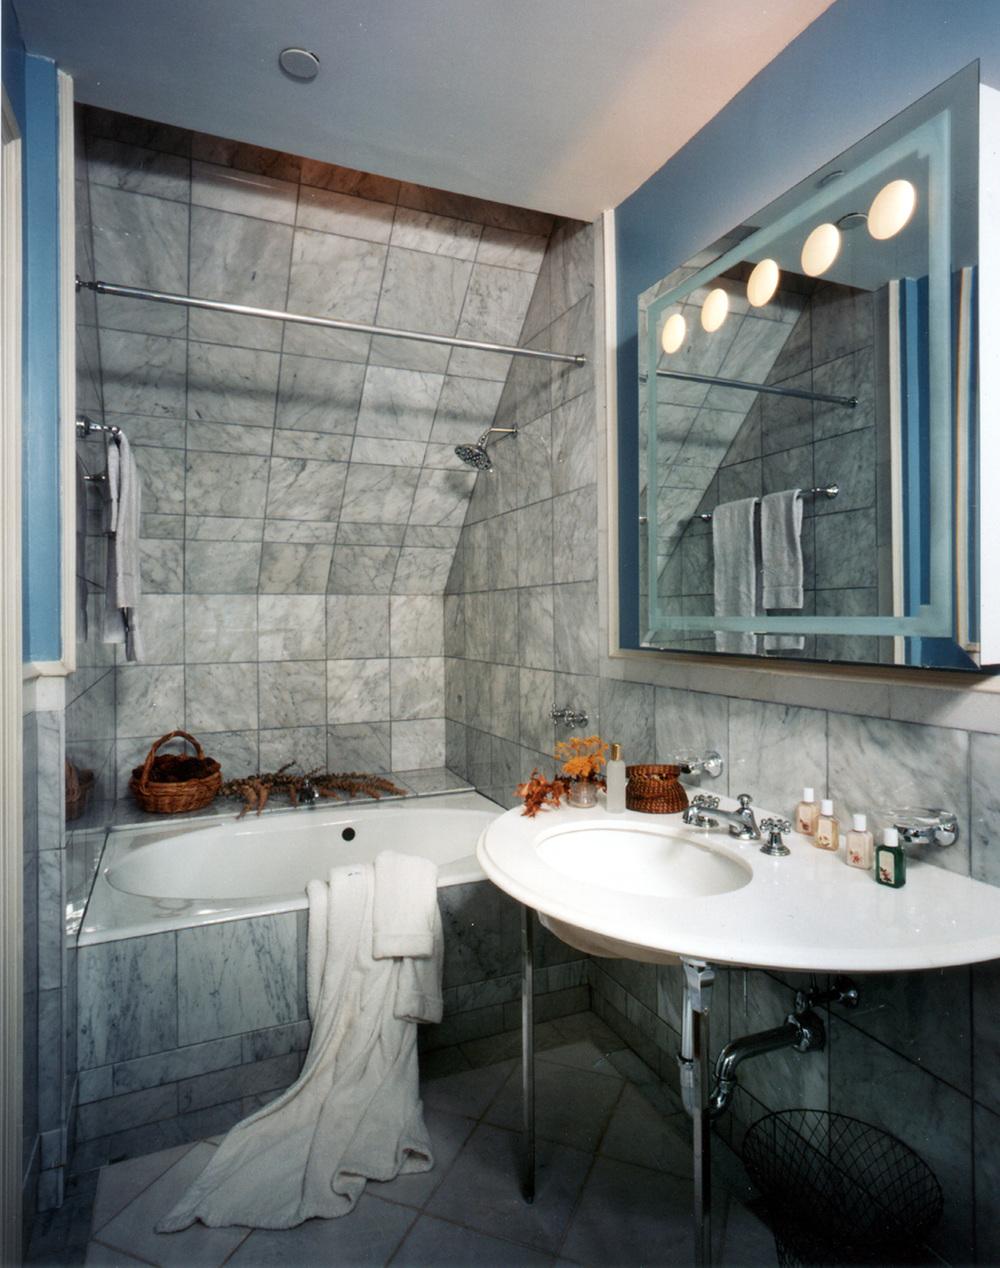 Mystery Point - Interior - Bathroom Sink & Tub.jpg